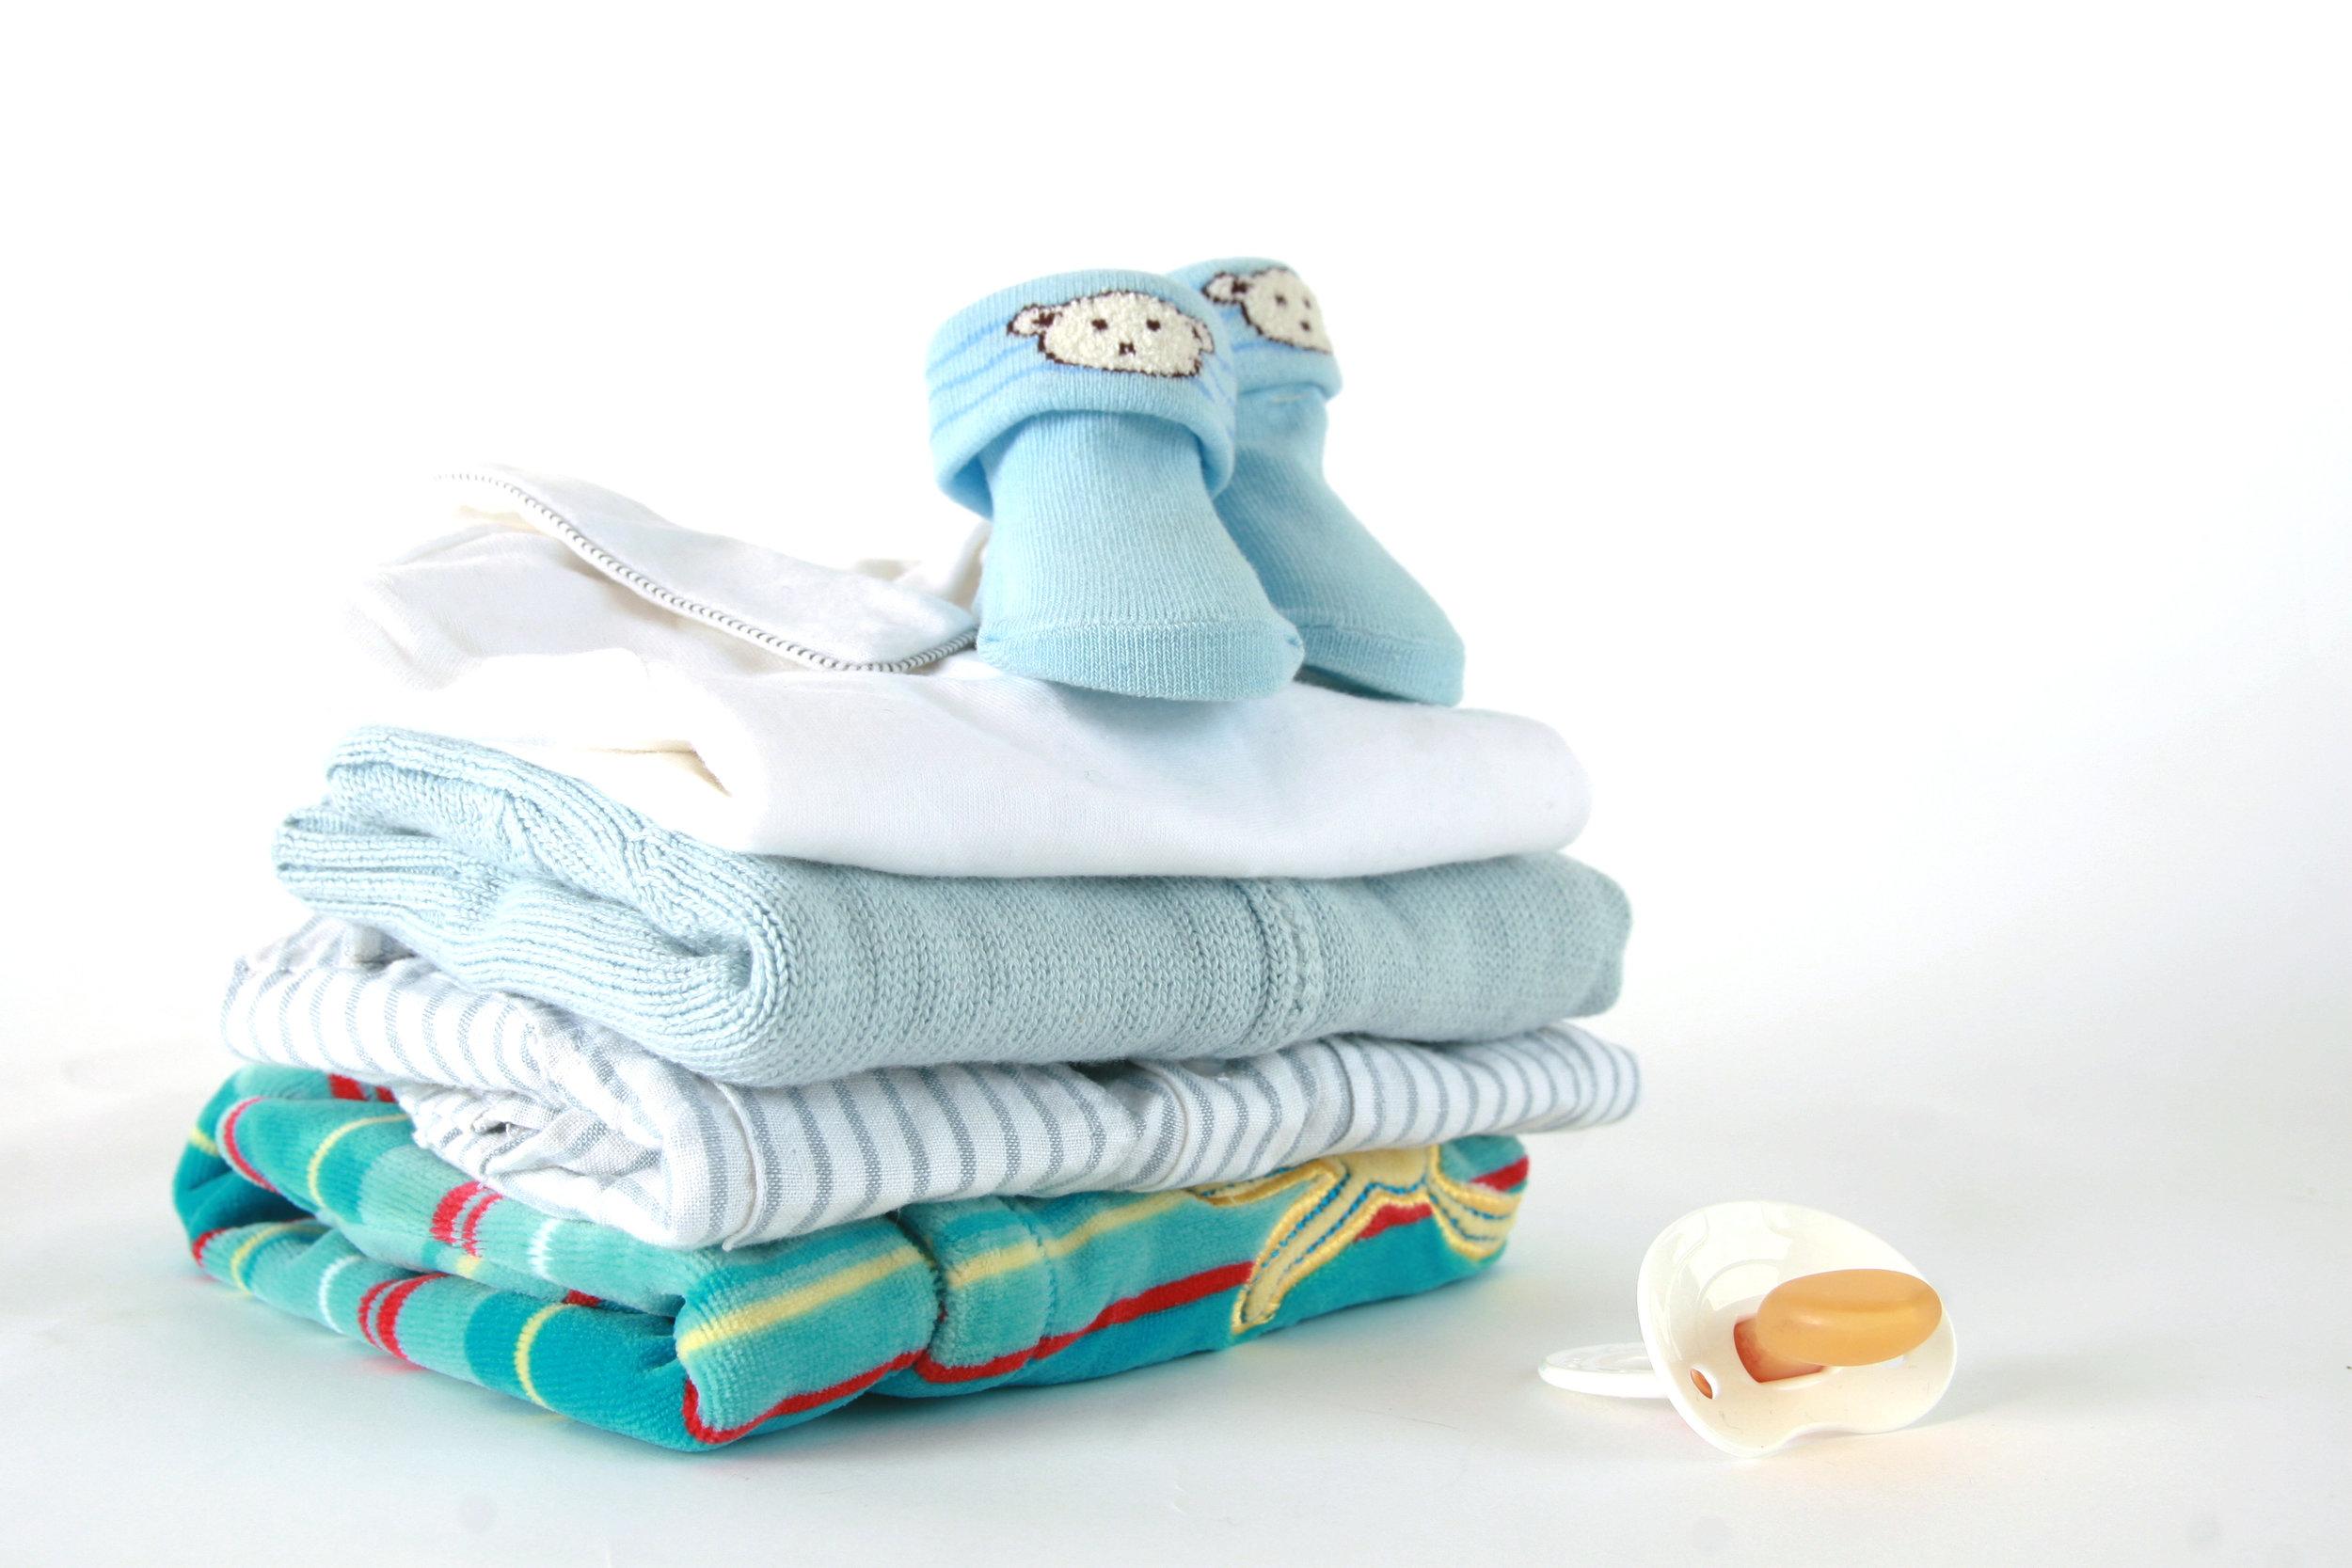 bigstock-Baby-Boy-Clothes-7667172.jpg